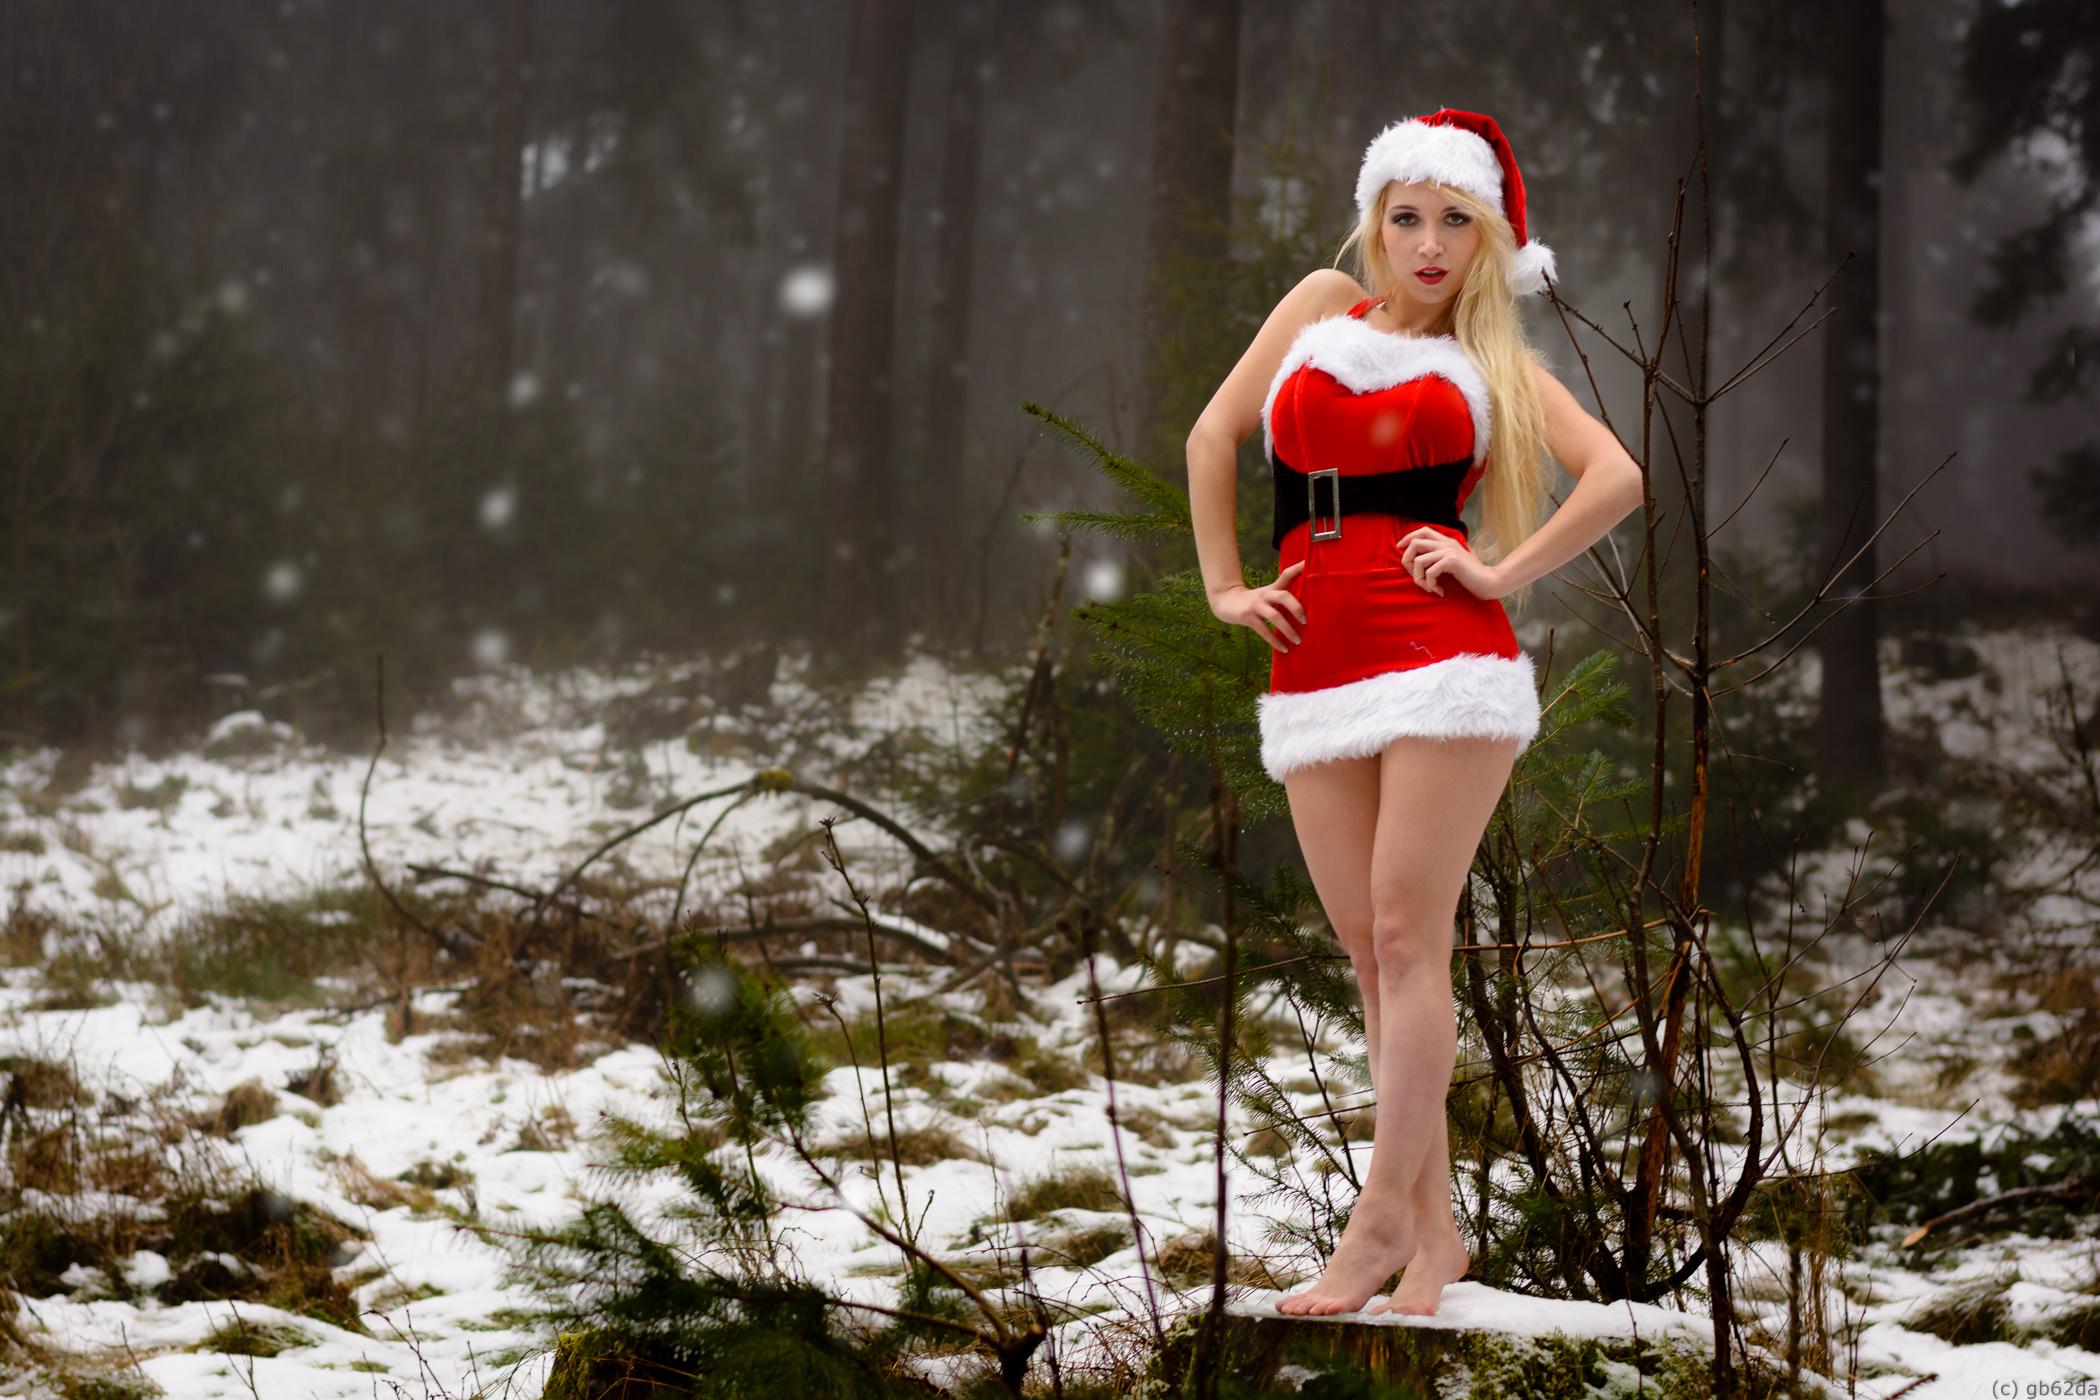 http://orig05.deviantart.net/63c3/f/2014/354/0/7/santa_claus__little_sister_by_gb62da-d8ai1c1.jpg